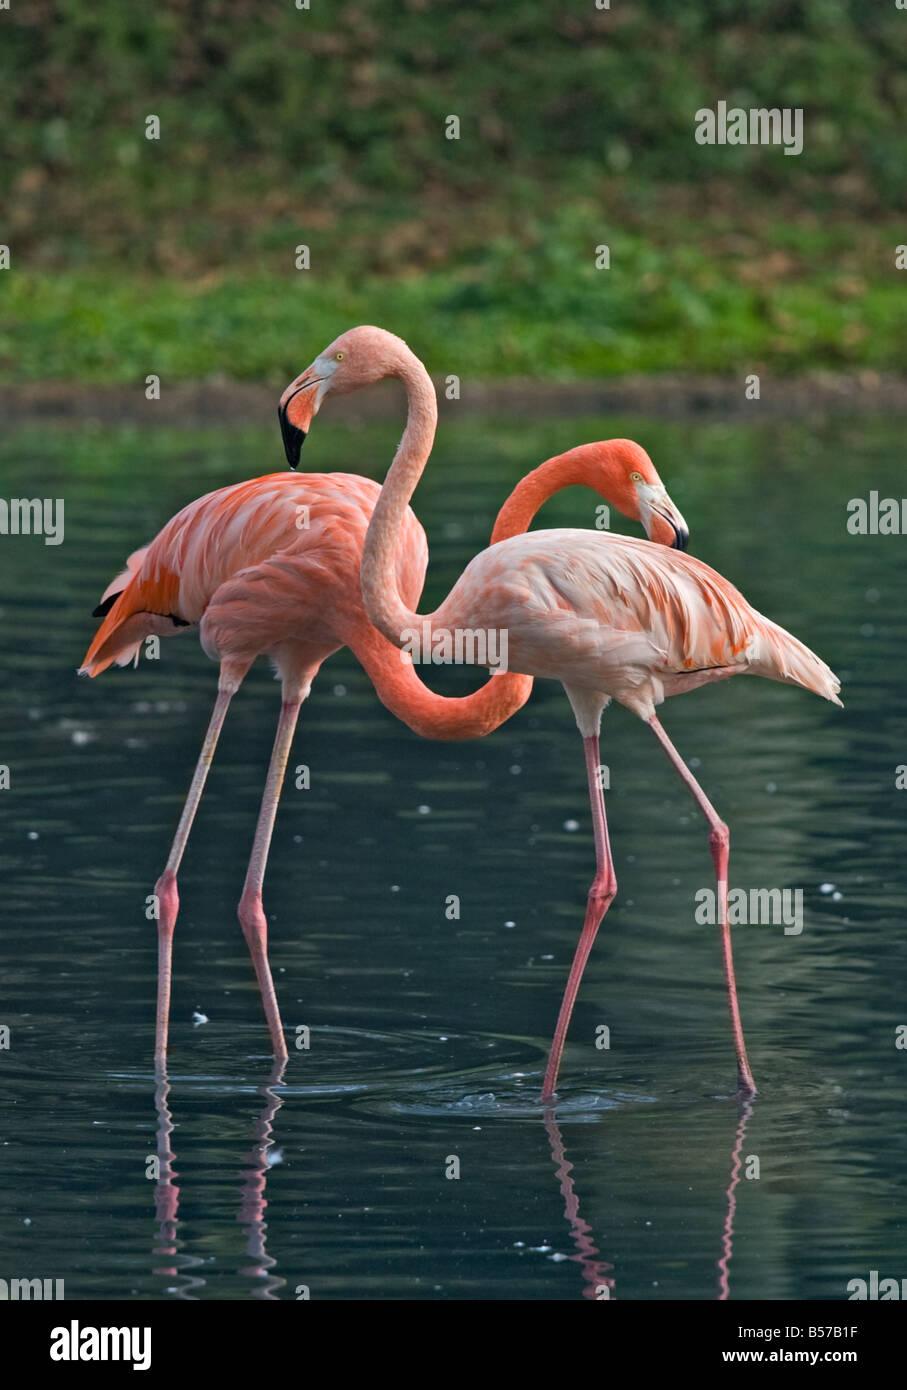 Two Caribbean Flamingos (Phoenicopterus ruber) - Stock Image